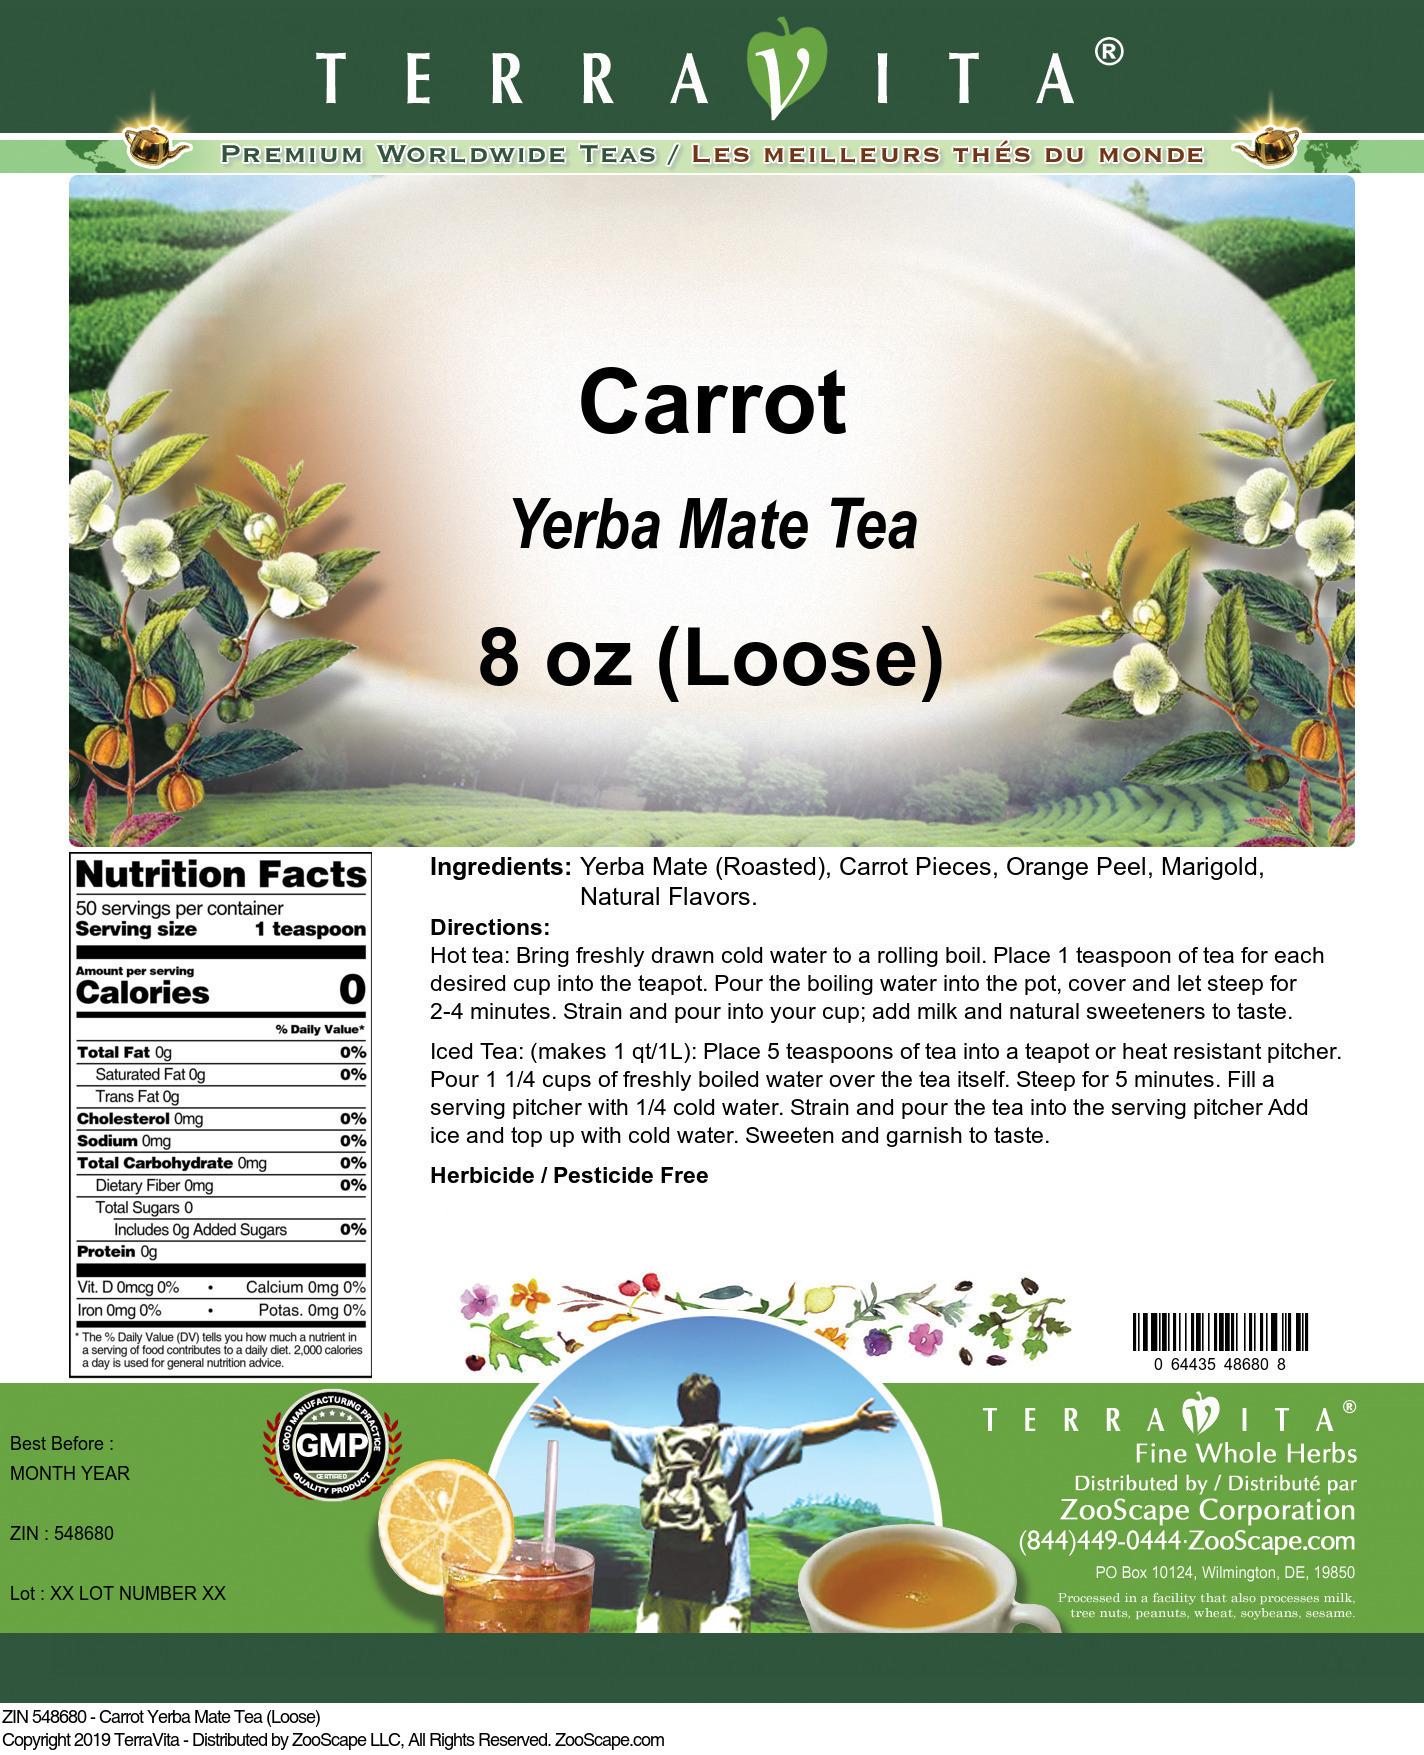 Carrot Yerba Mate